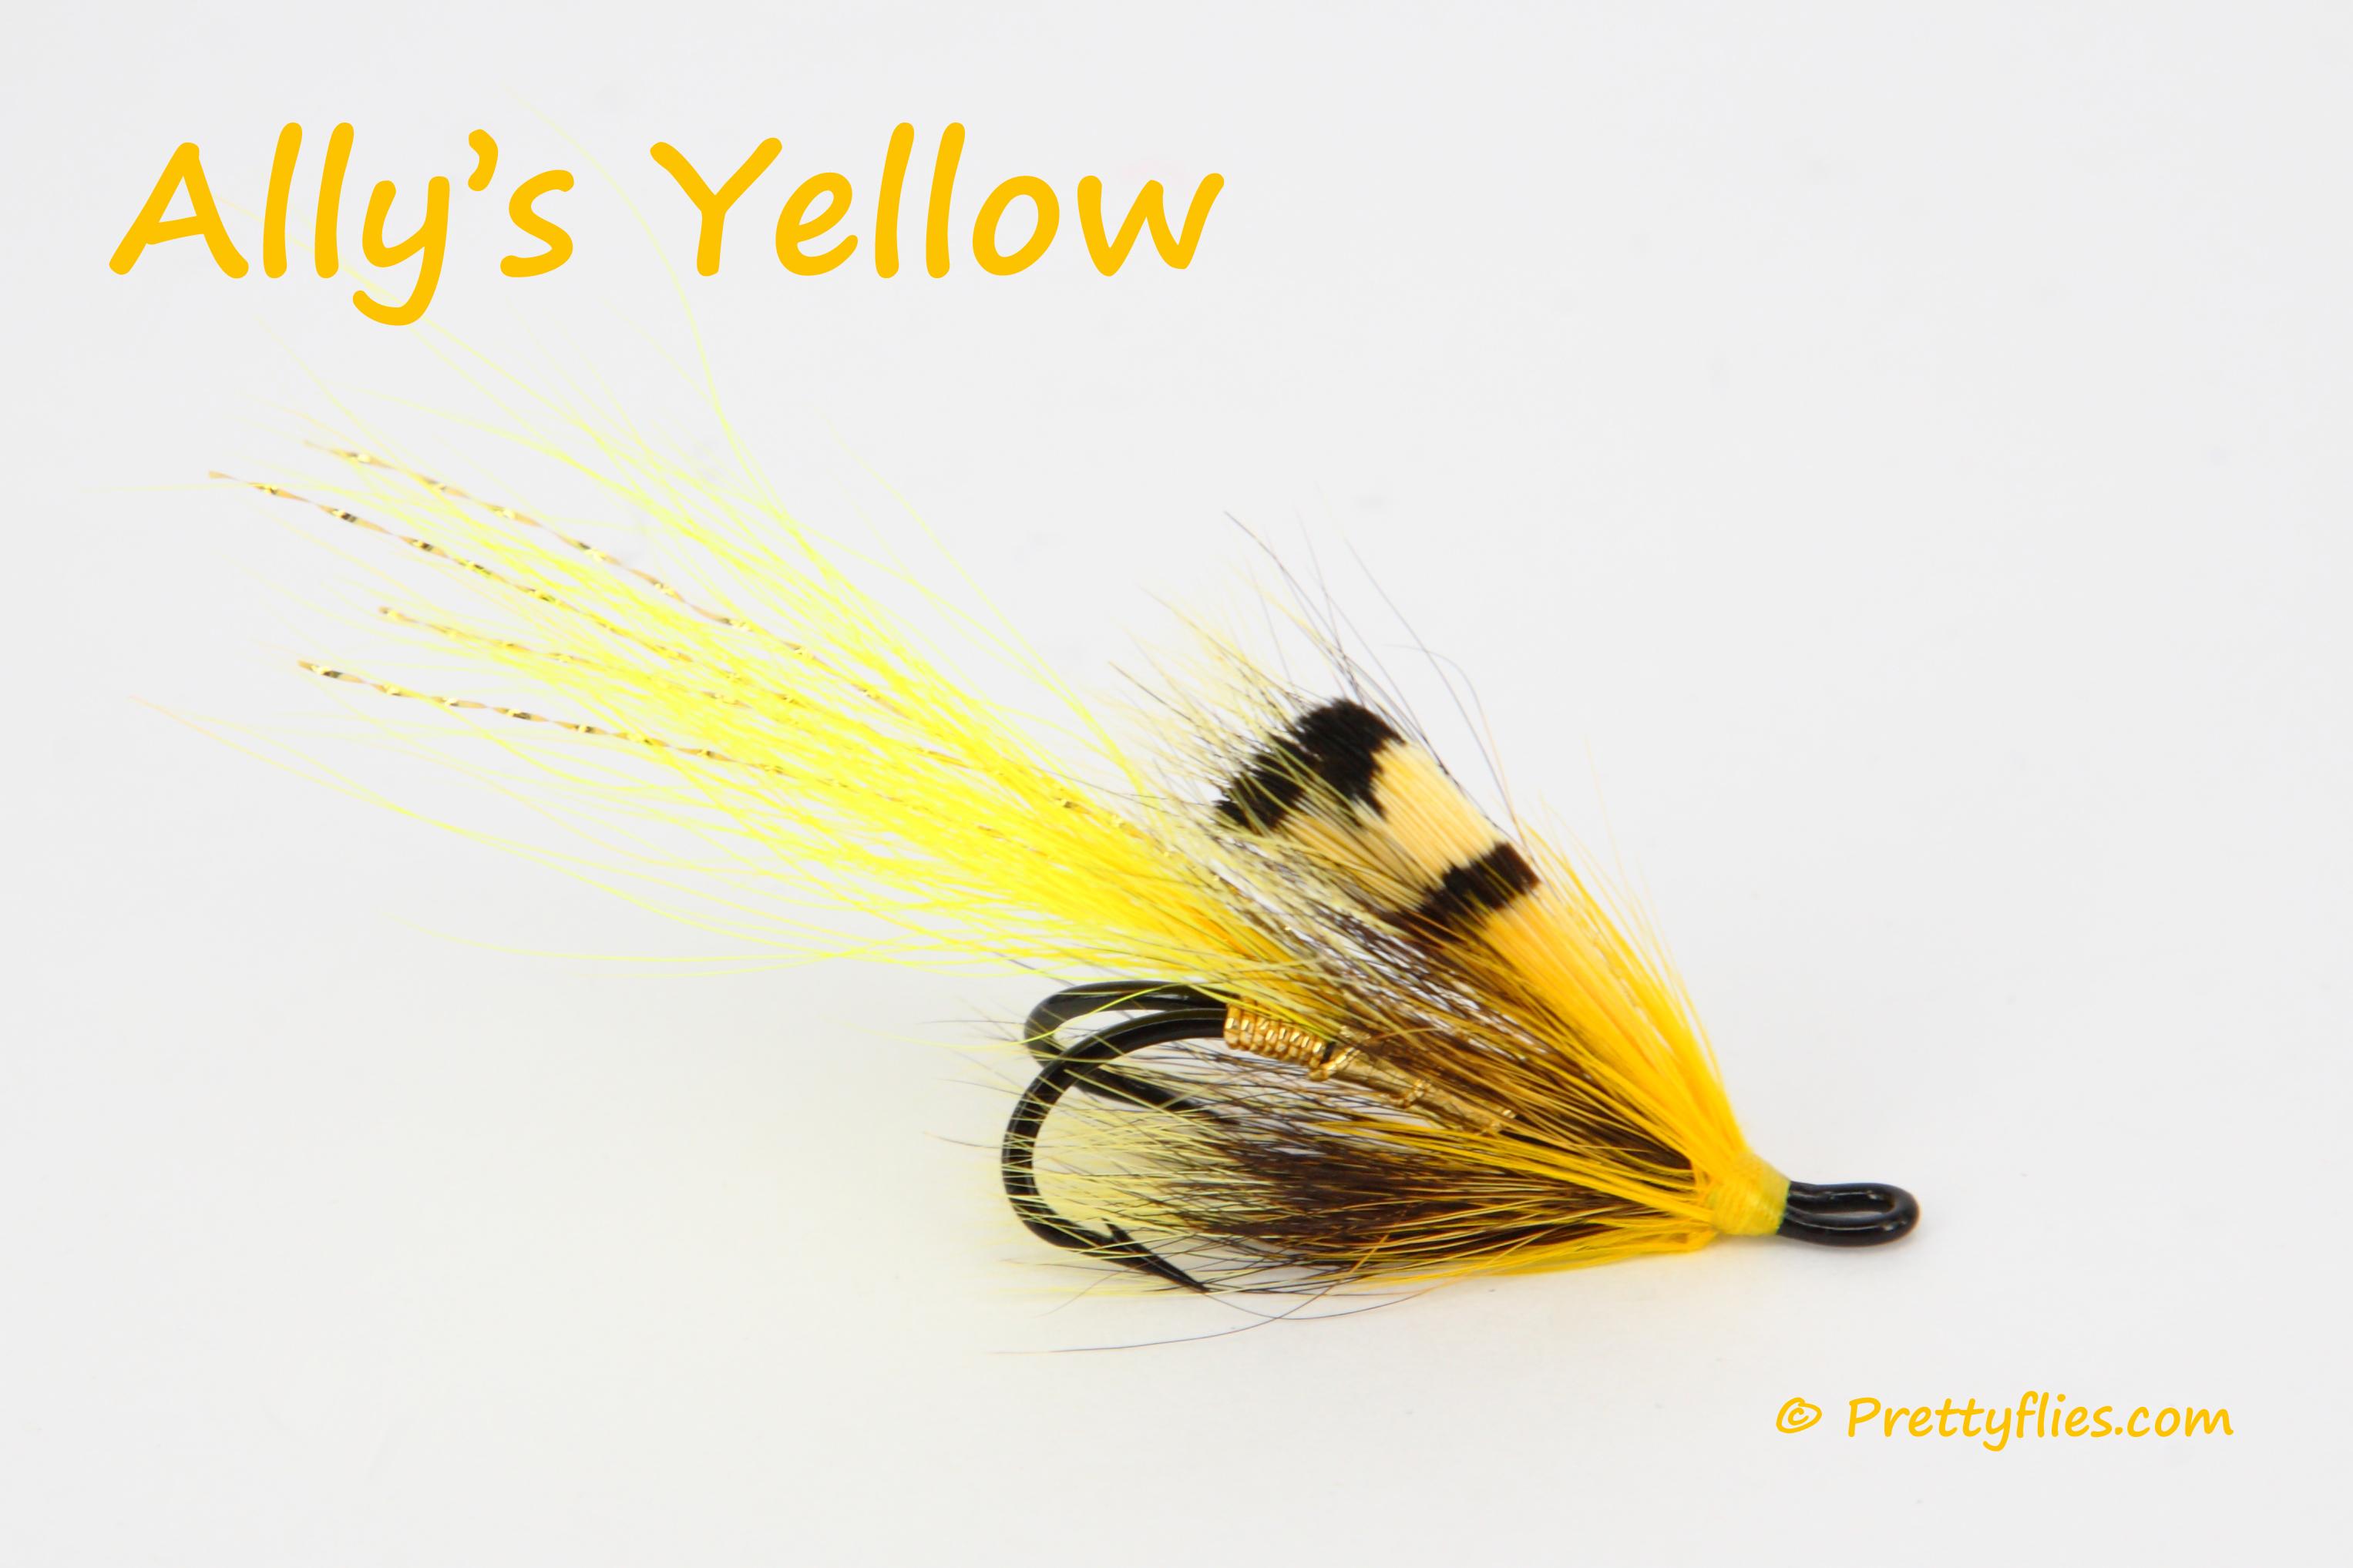 Allys Yellow copy.jpg